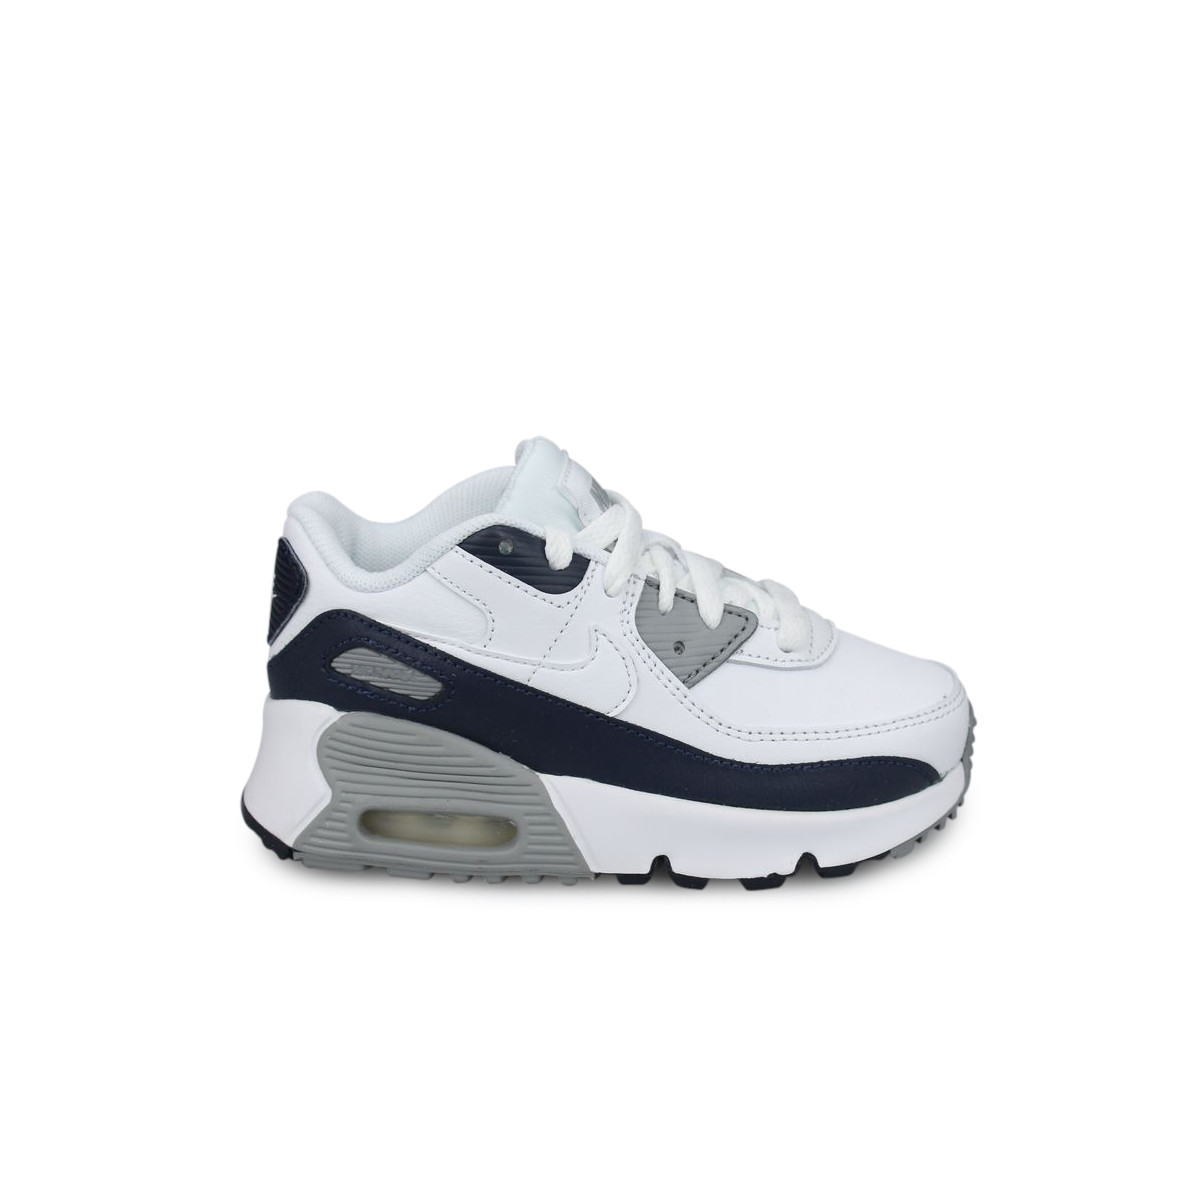 NIKE AIR MAX 90 LTR ENFANT NOIR - Street Shoes Addict